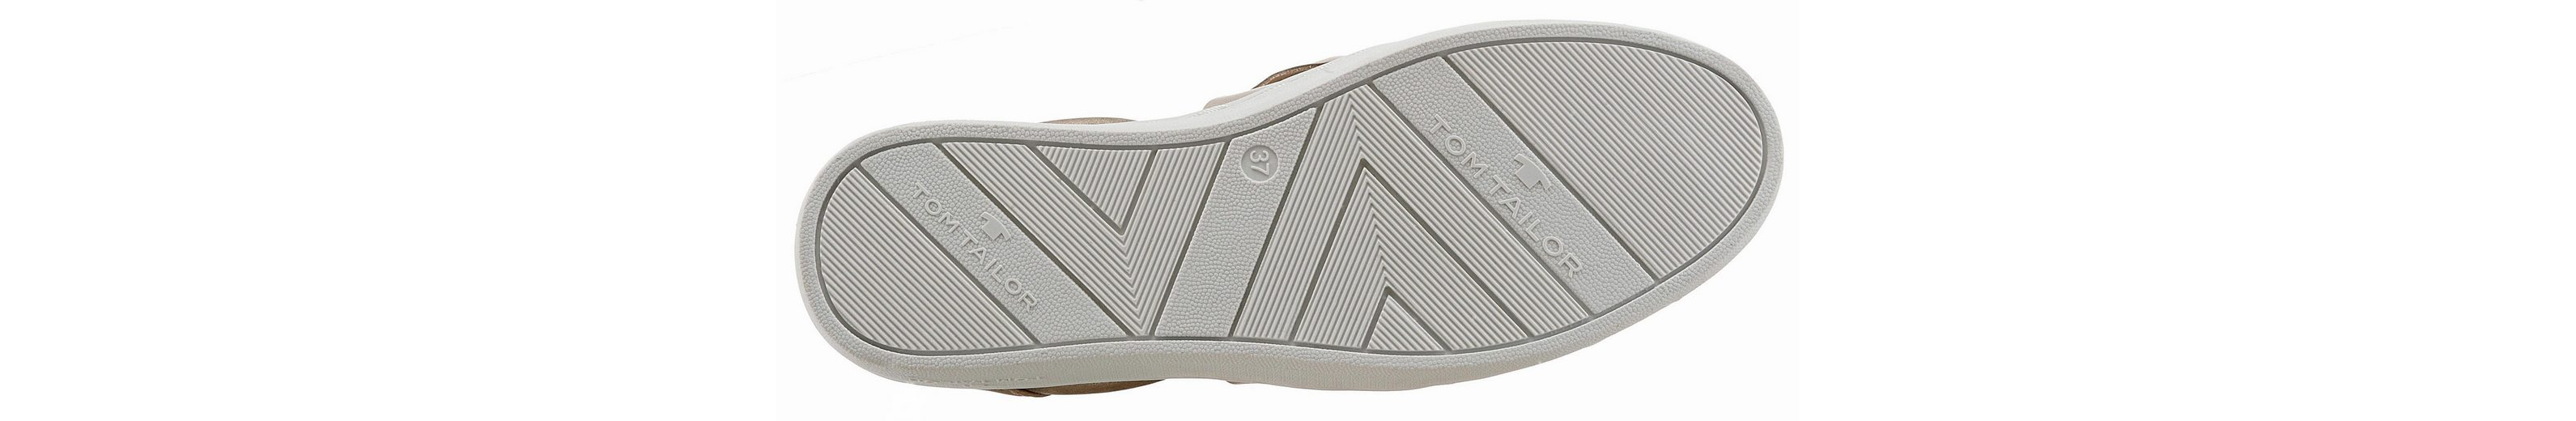 Tom Tailor Slip-On Sneaker, mit Zierschleife